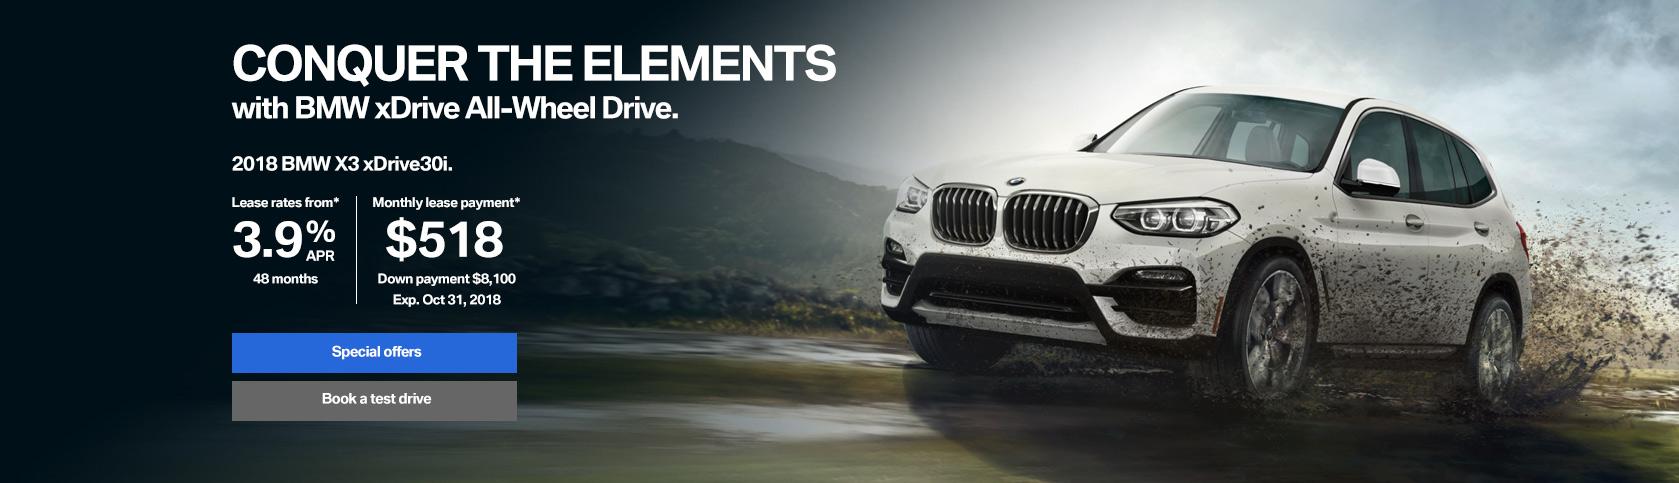 2018_BMW_OctDAG_X3_Banner_1679x483_GTA